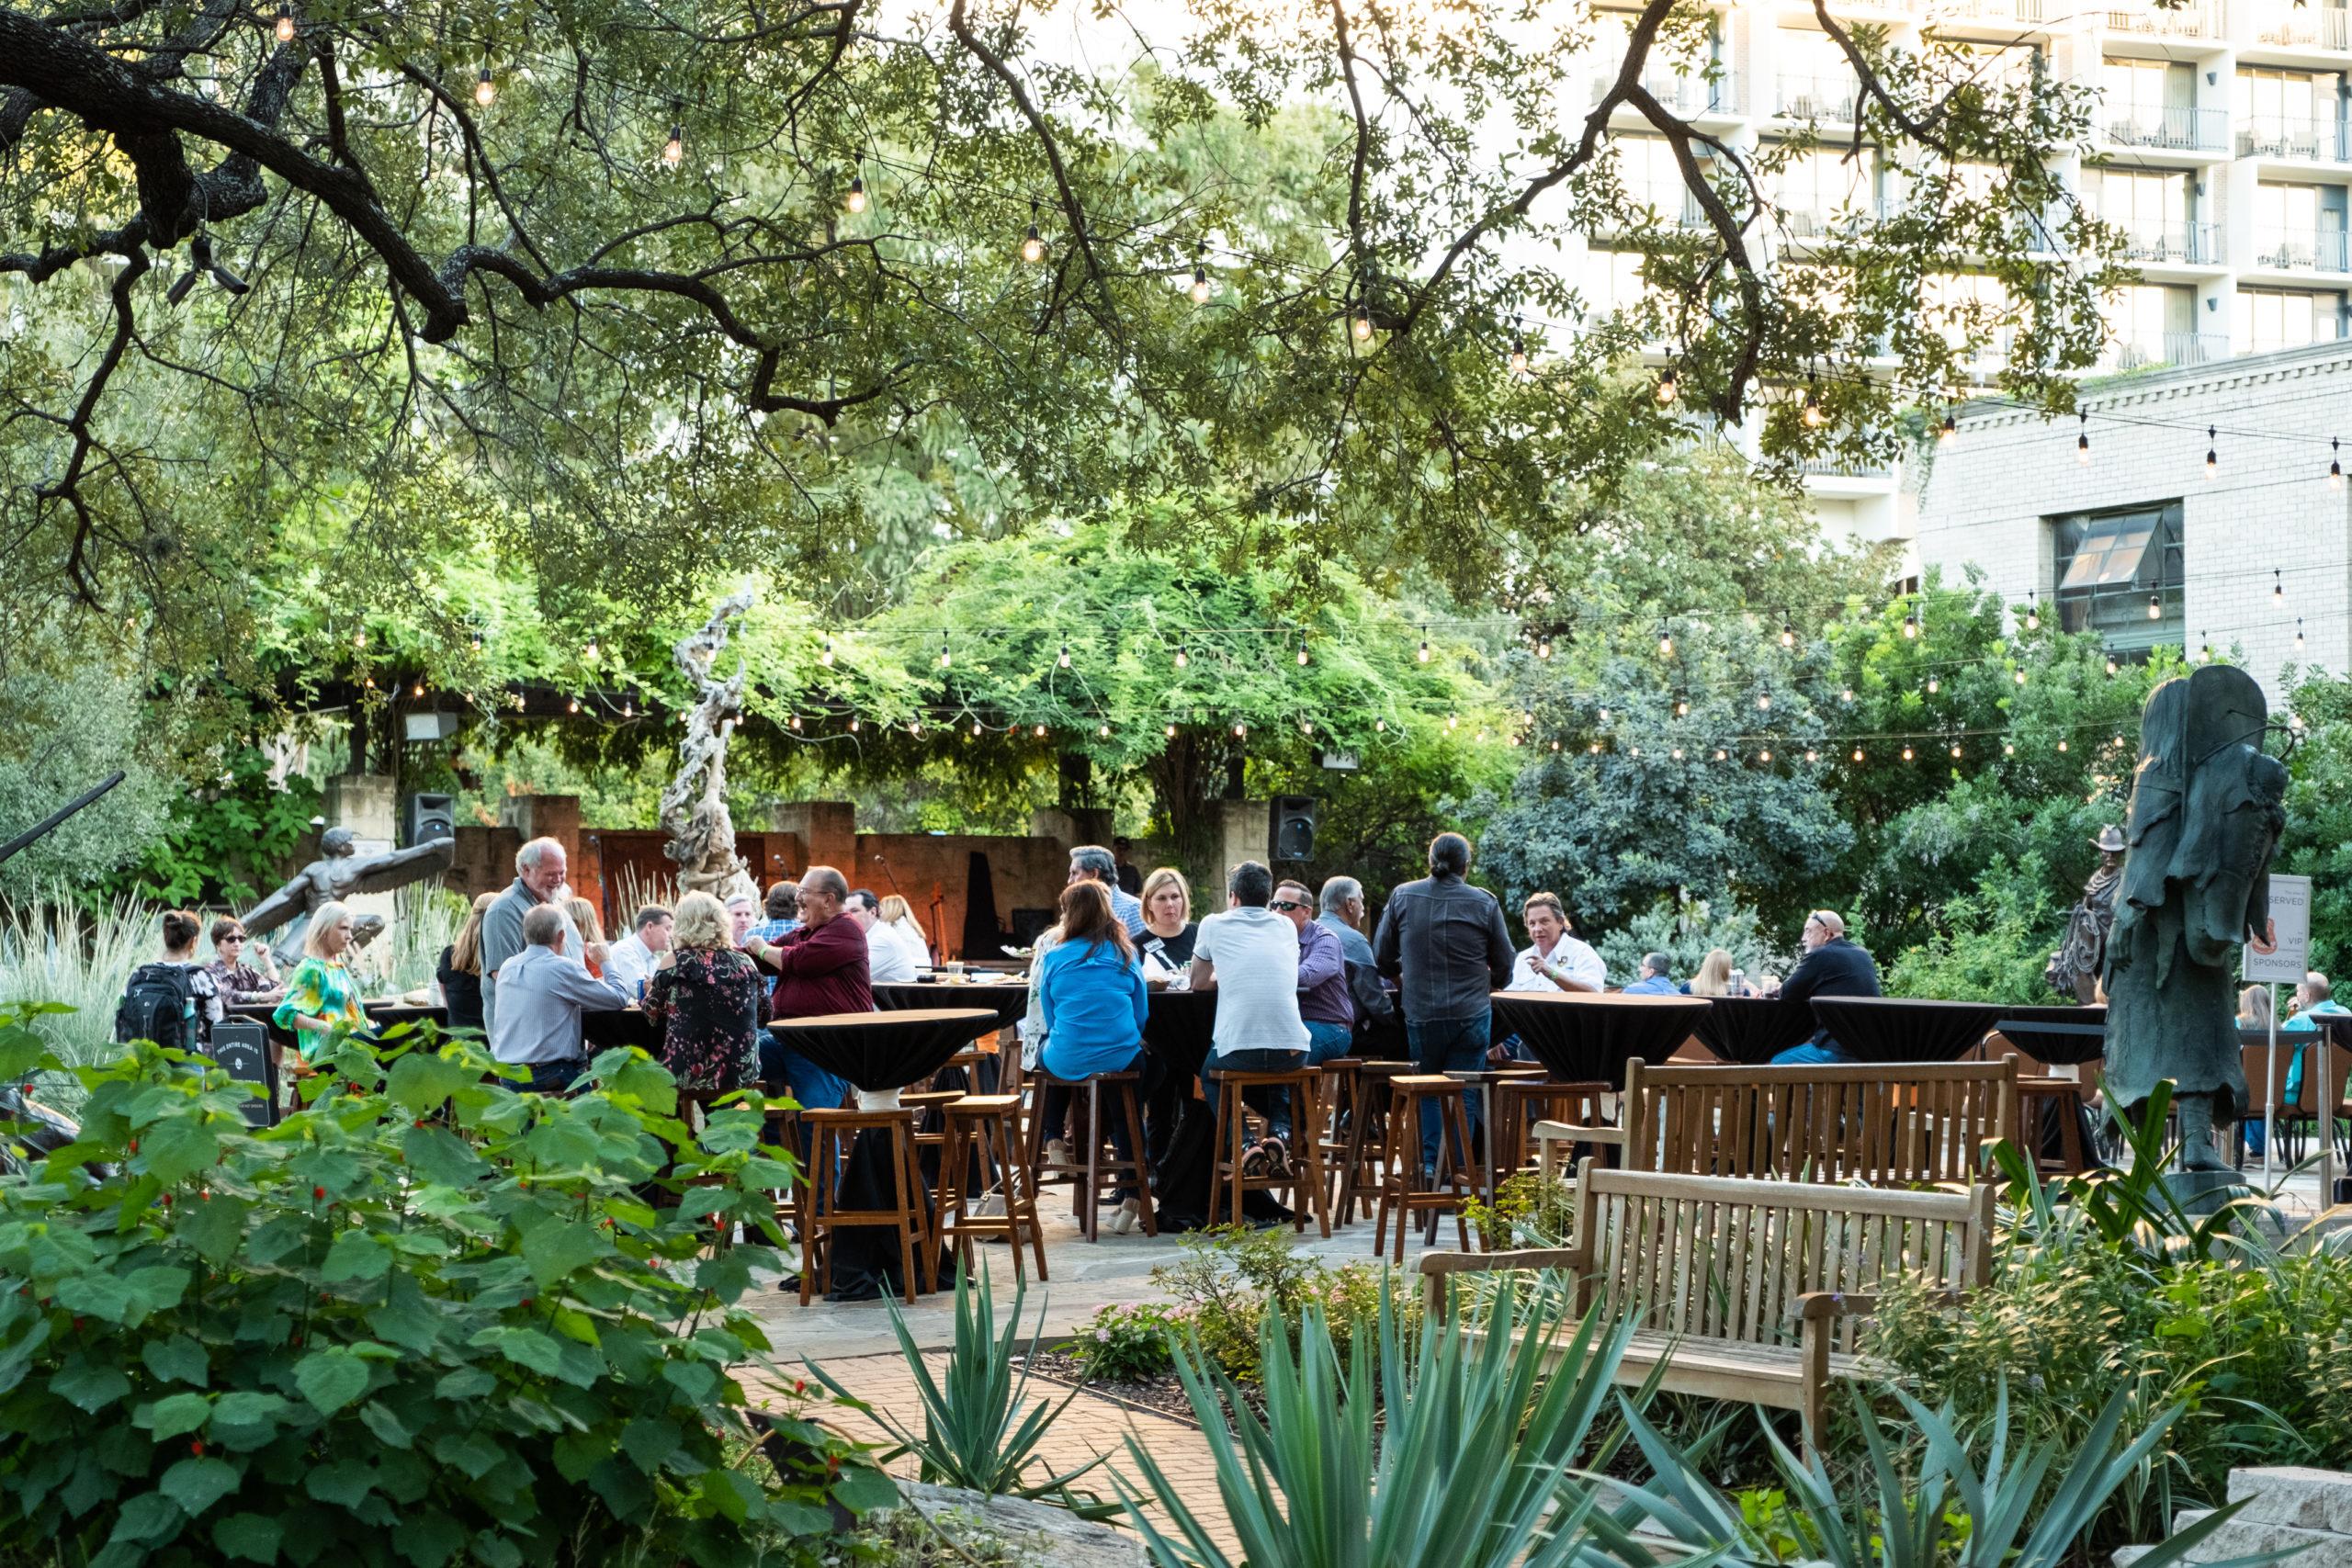 8 Fun Things To Do In San Antonio This Weekend June 10 13 San Antonio Magazine